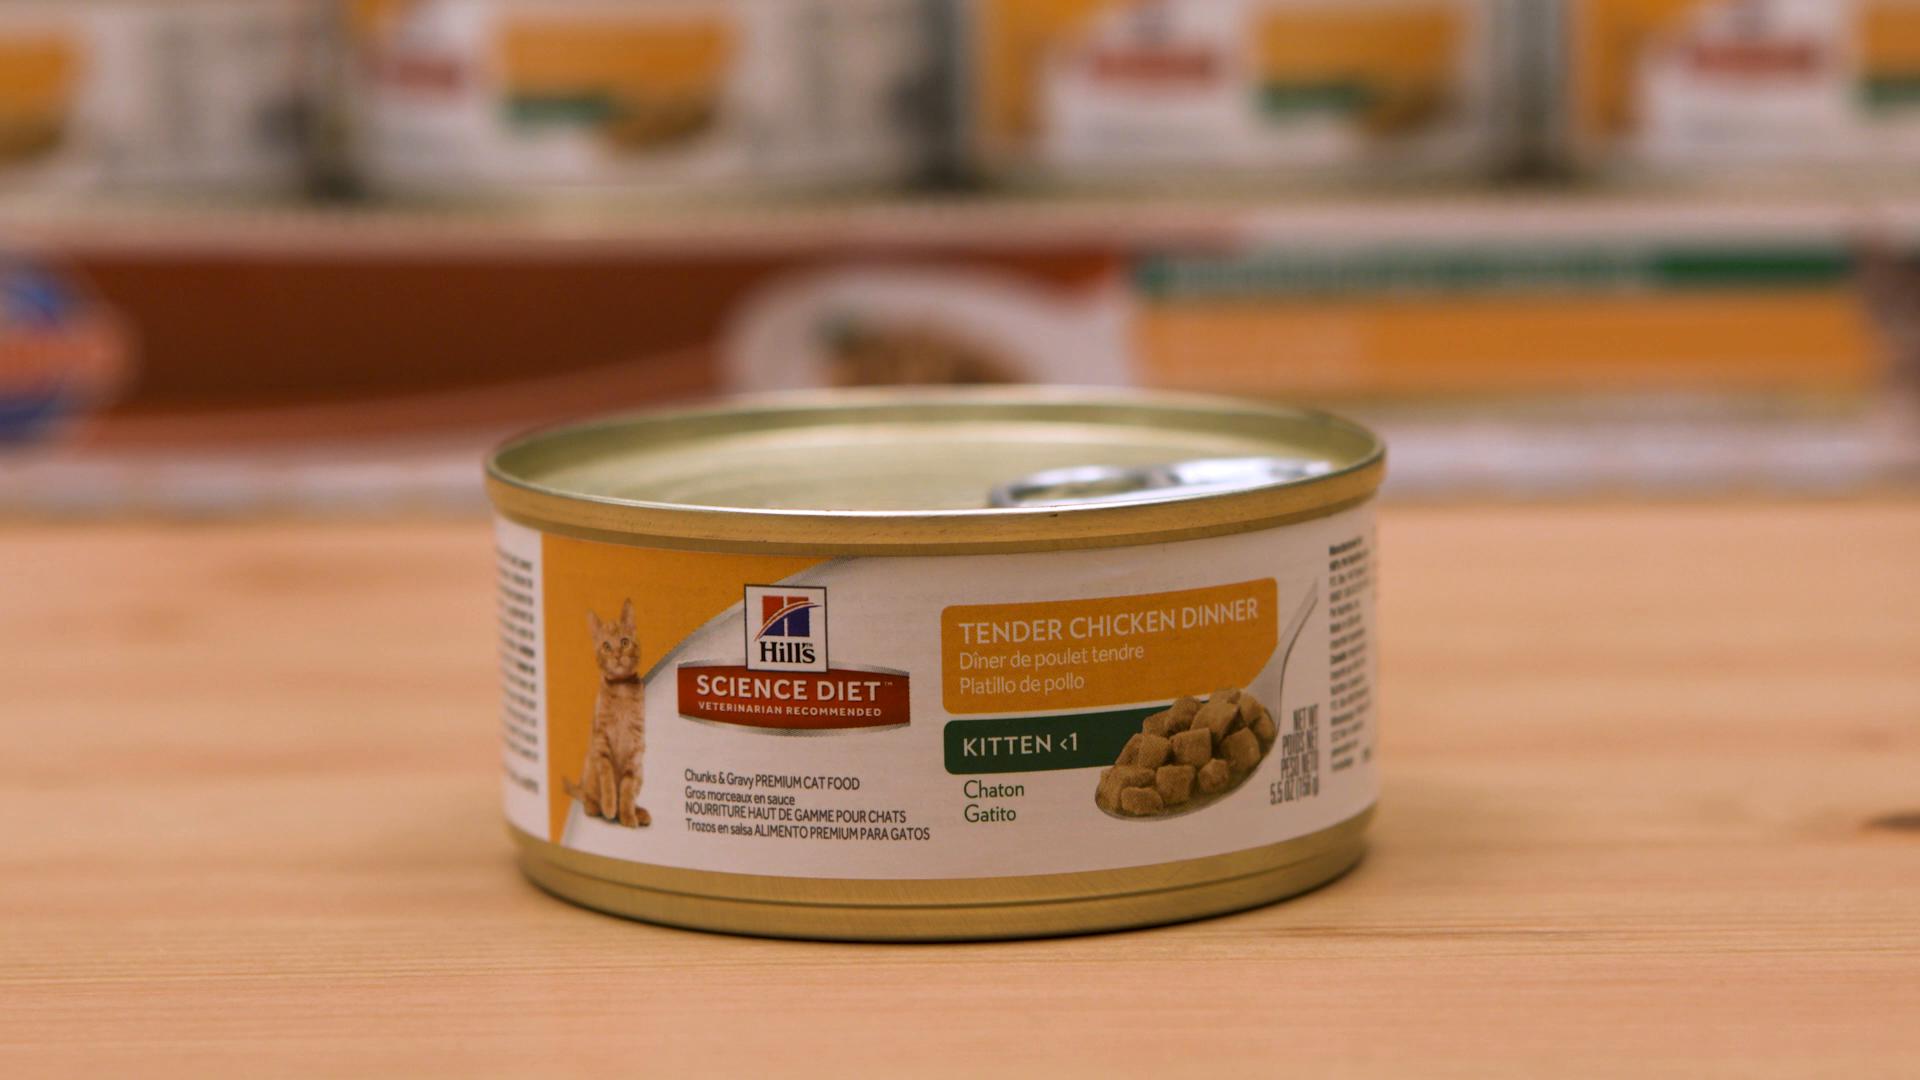 Hills Science Diet Kitten Tender Chicken Dinner Chunks and Gravy Cat Food Can, 24-Pack